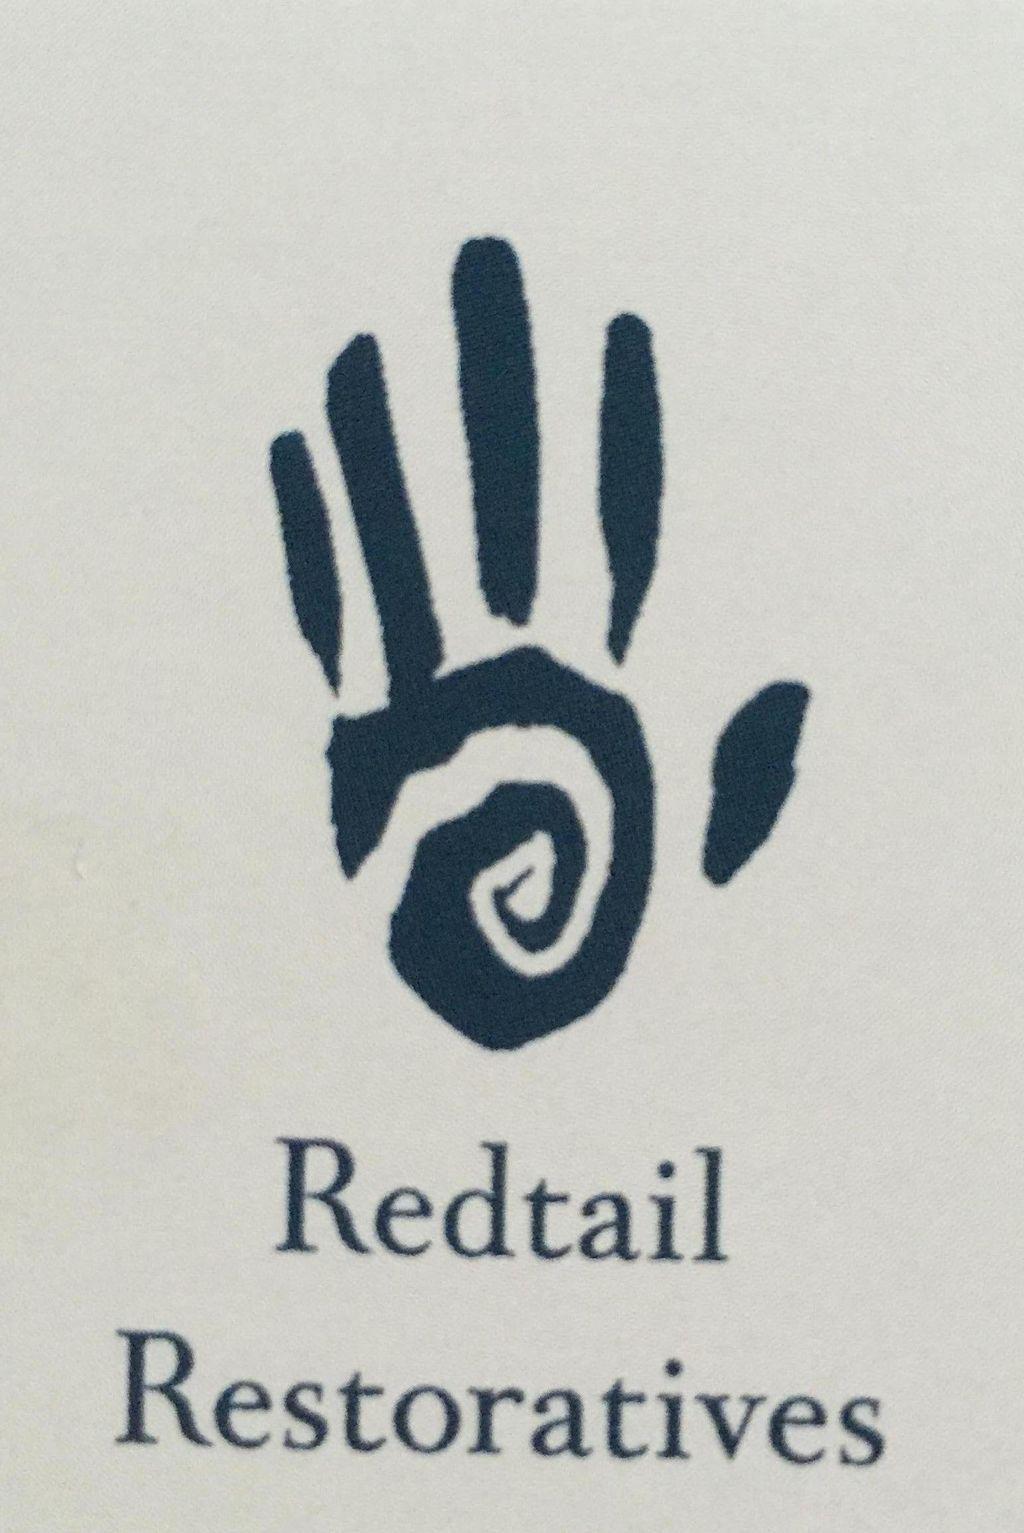 Redtail Restoratives LLC